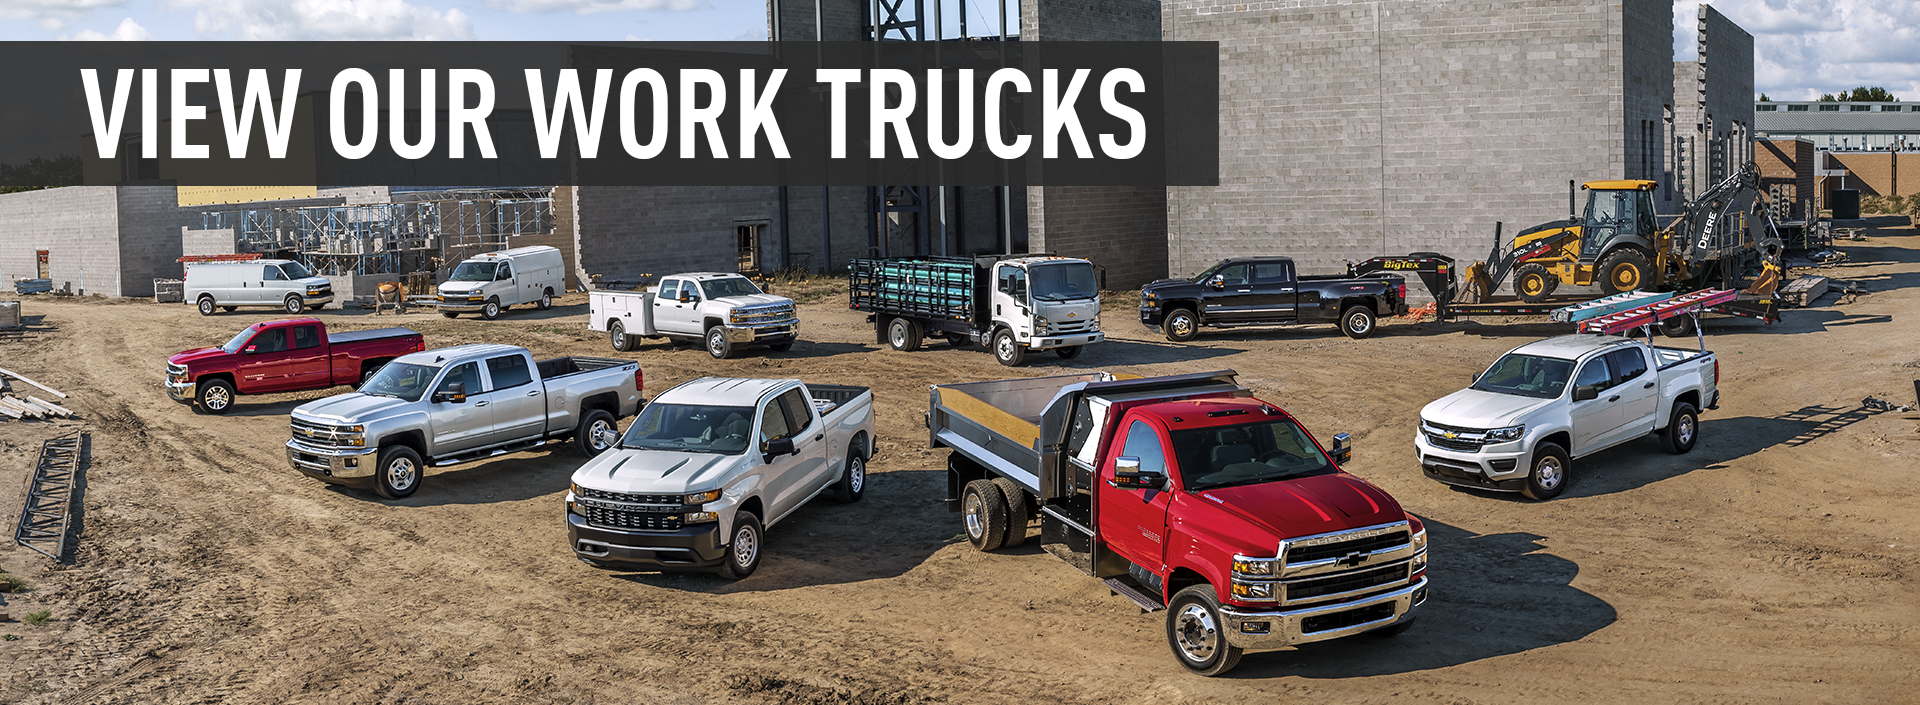 Chevy-Work-Trucks (1)